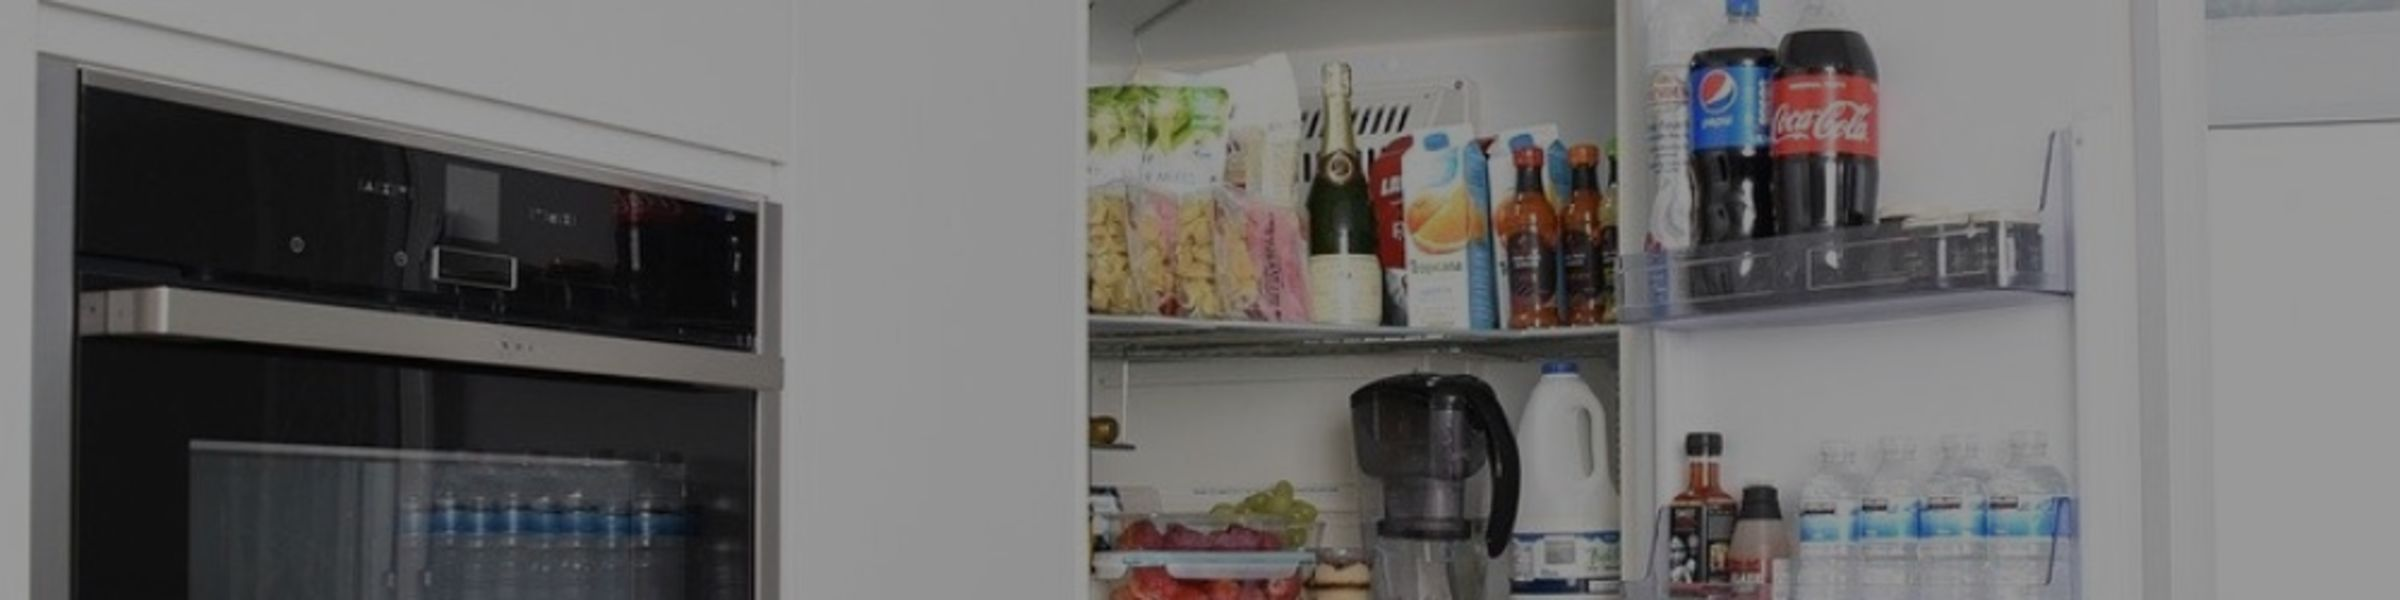 refrigerator repair pros in Midrand